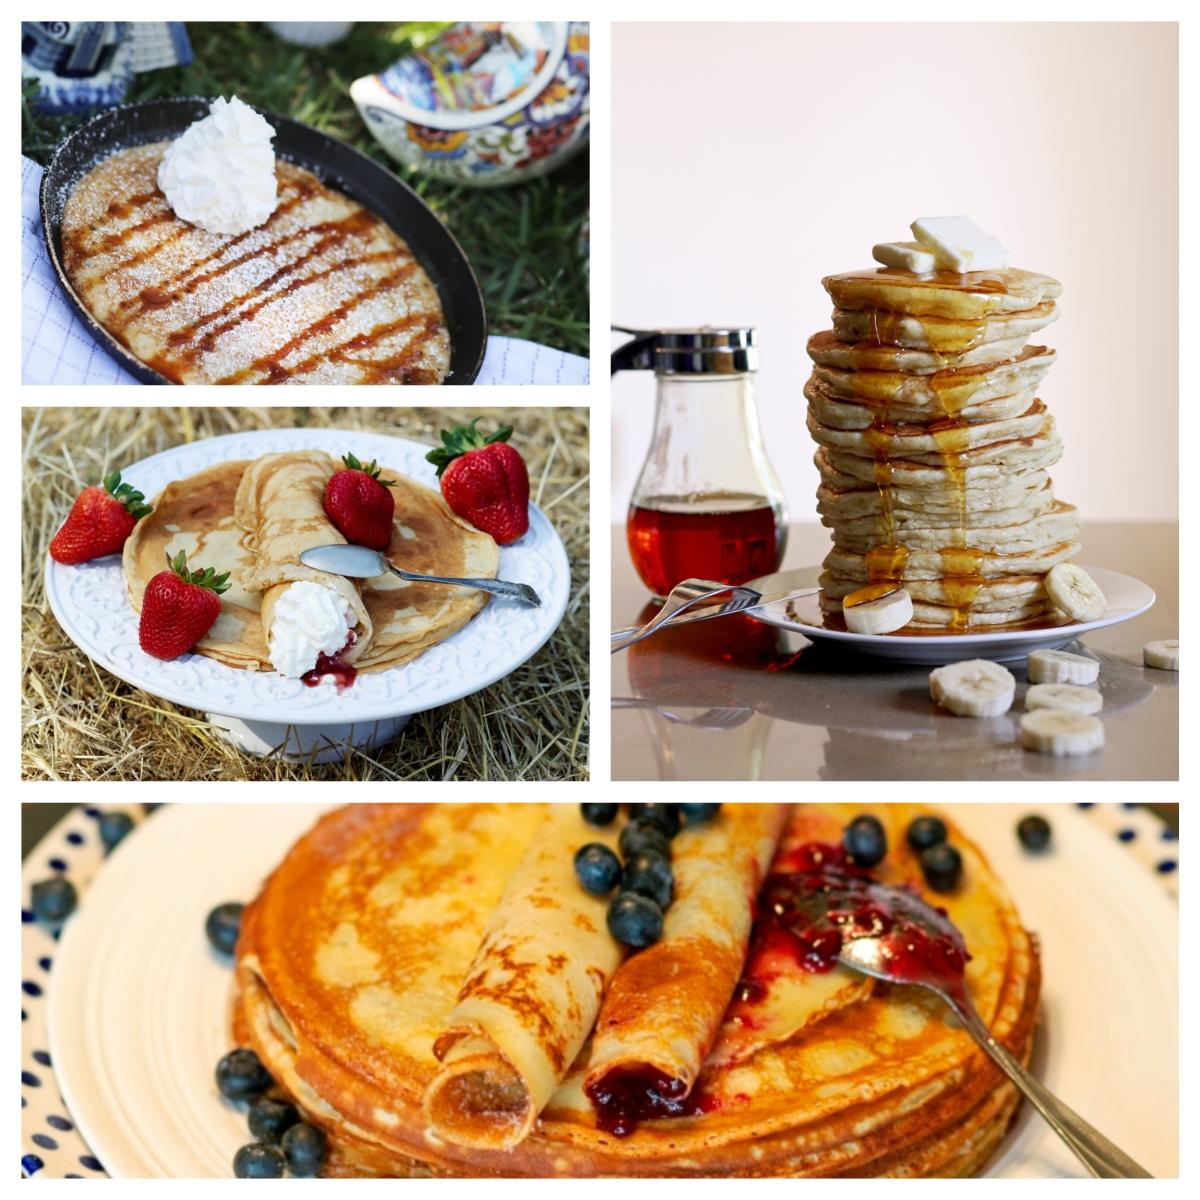 Your choice ofpancakes